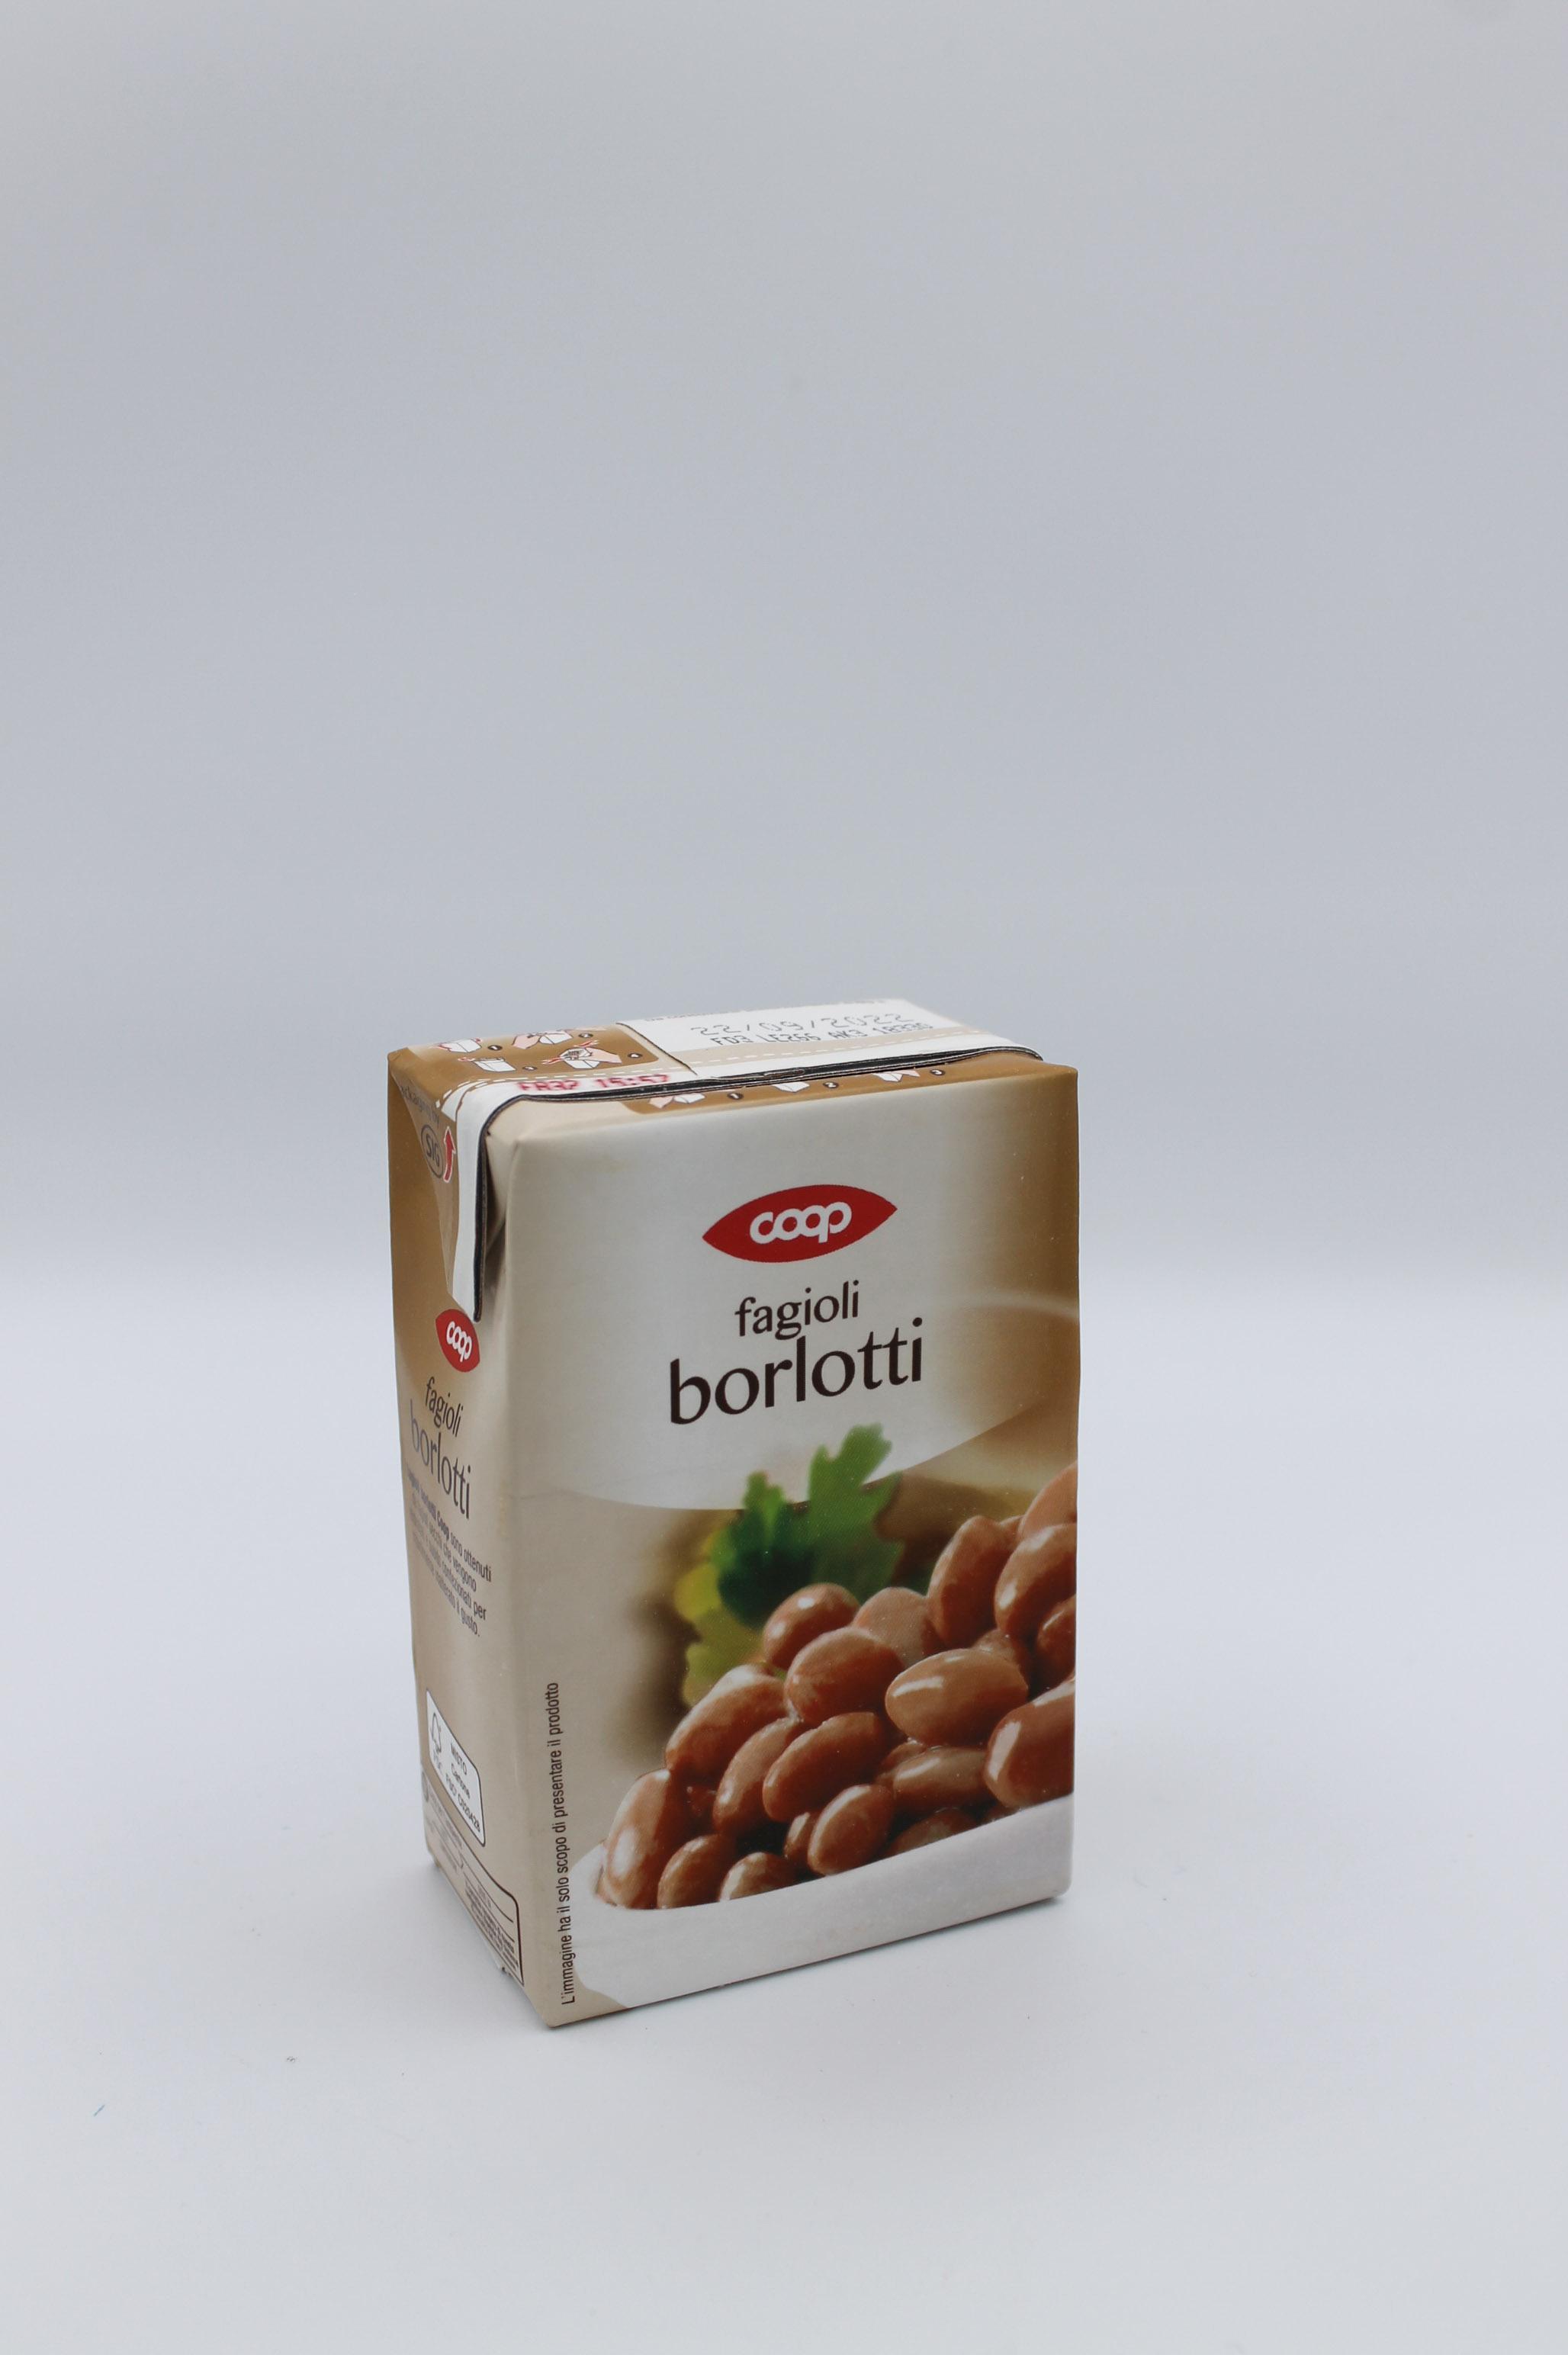 Coop fagioli borlotti 230 gr.